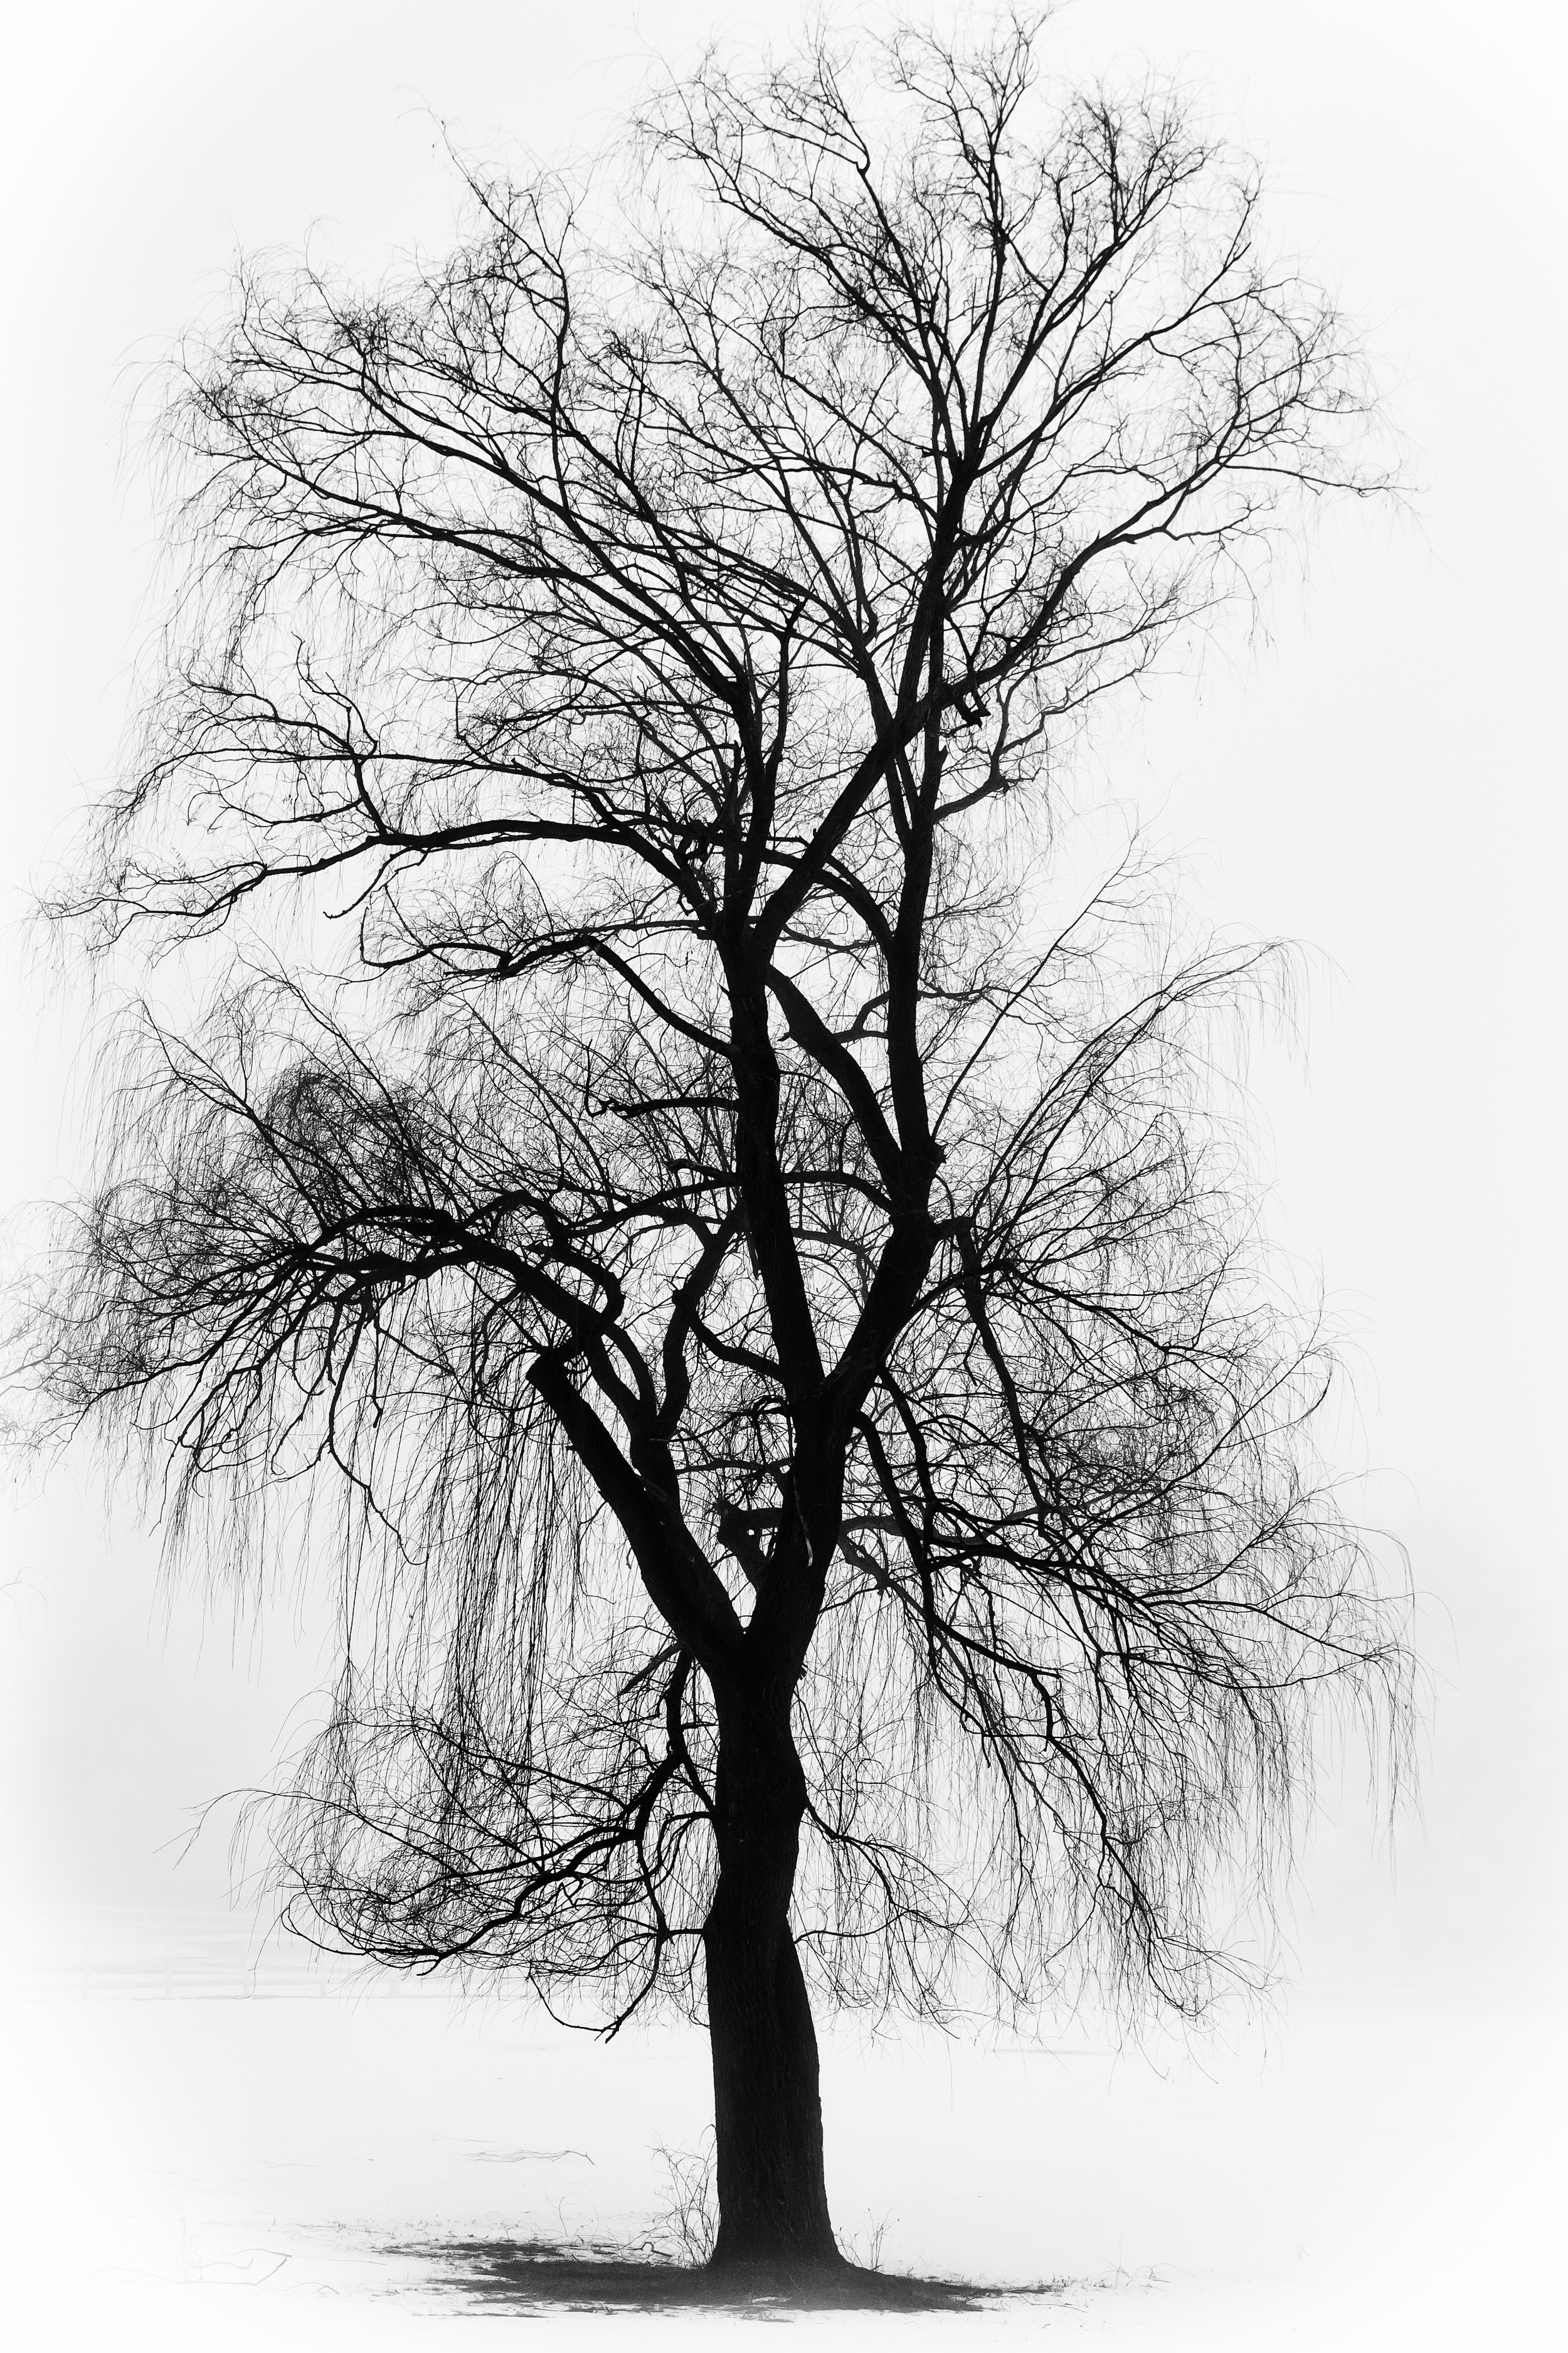 Winter Willow 1026